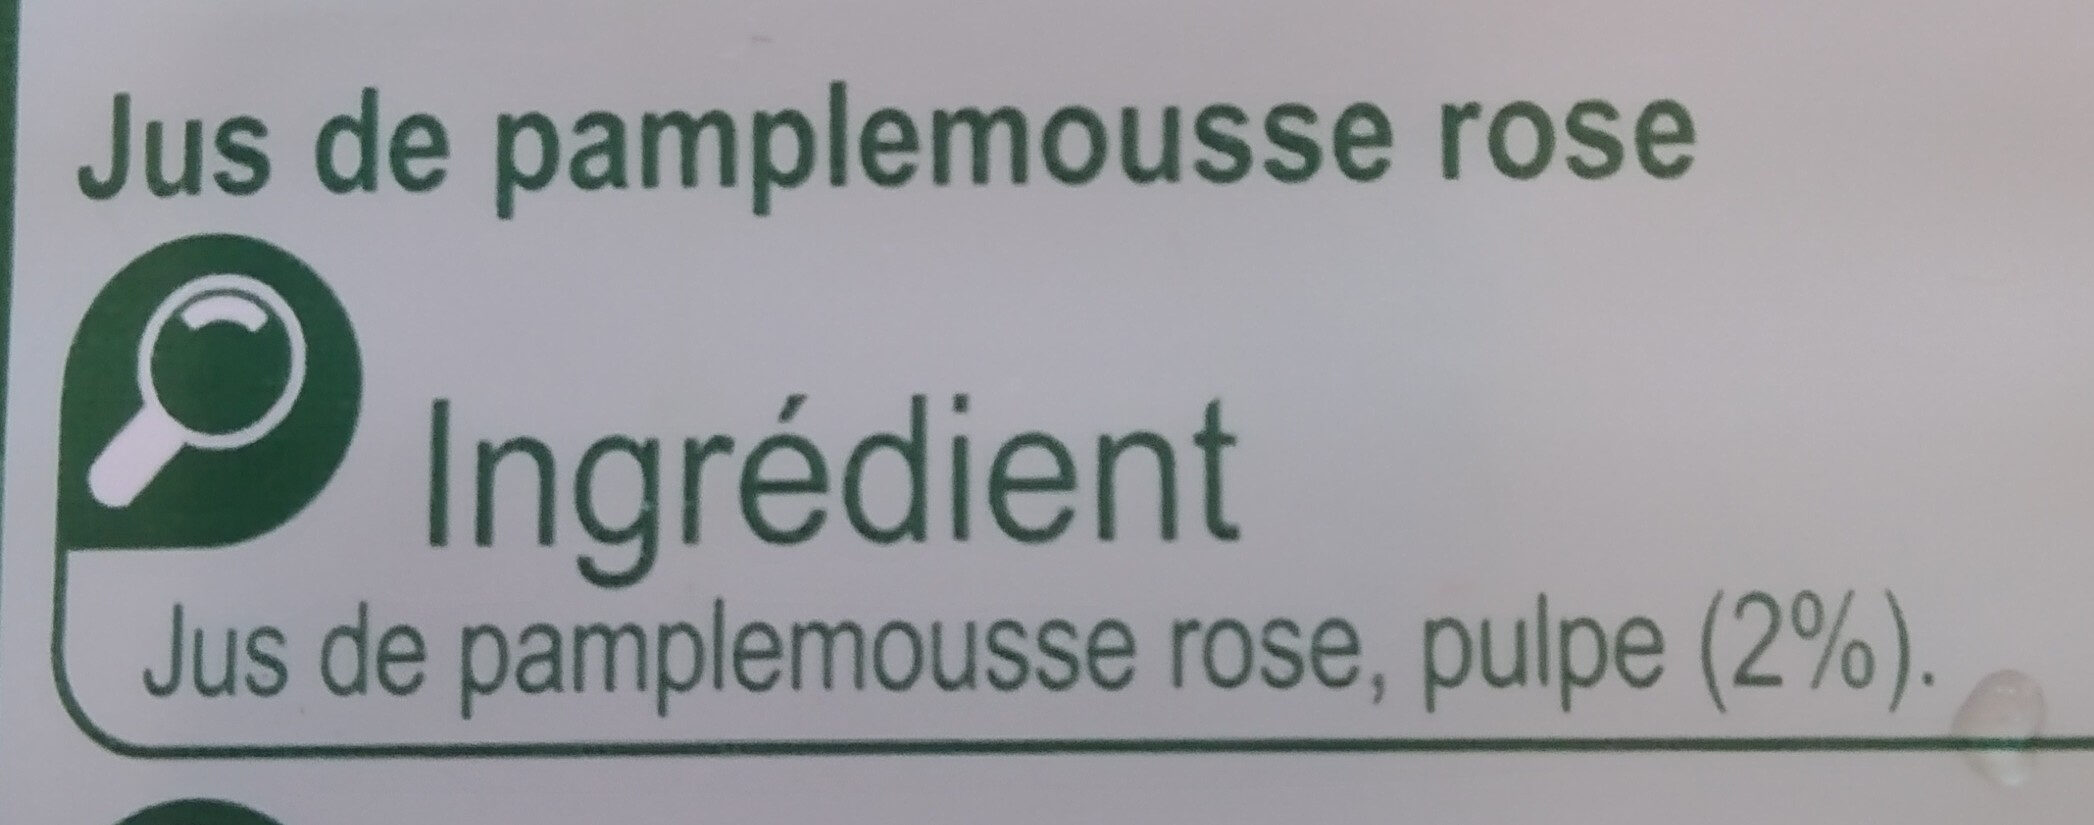 Pamplemousse rose, 100 % Pur Fruit Pressé - Ingredienti - fr